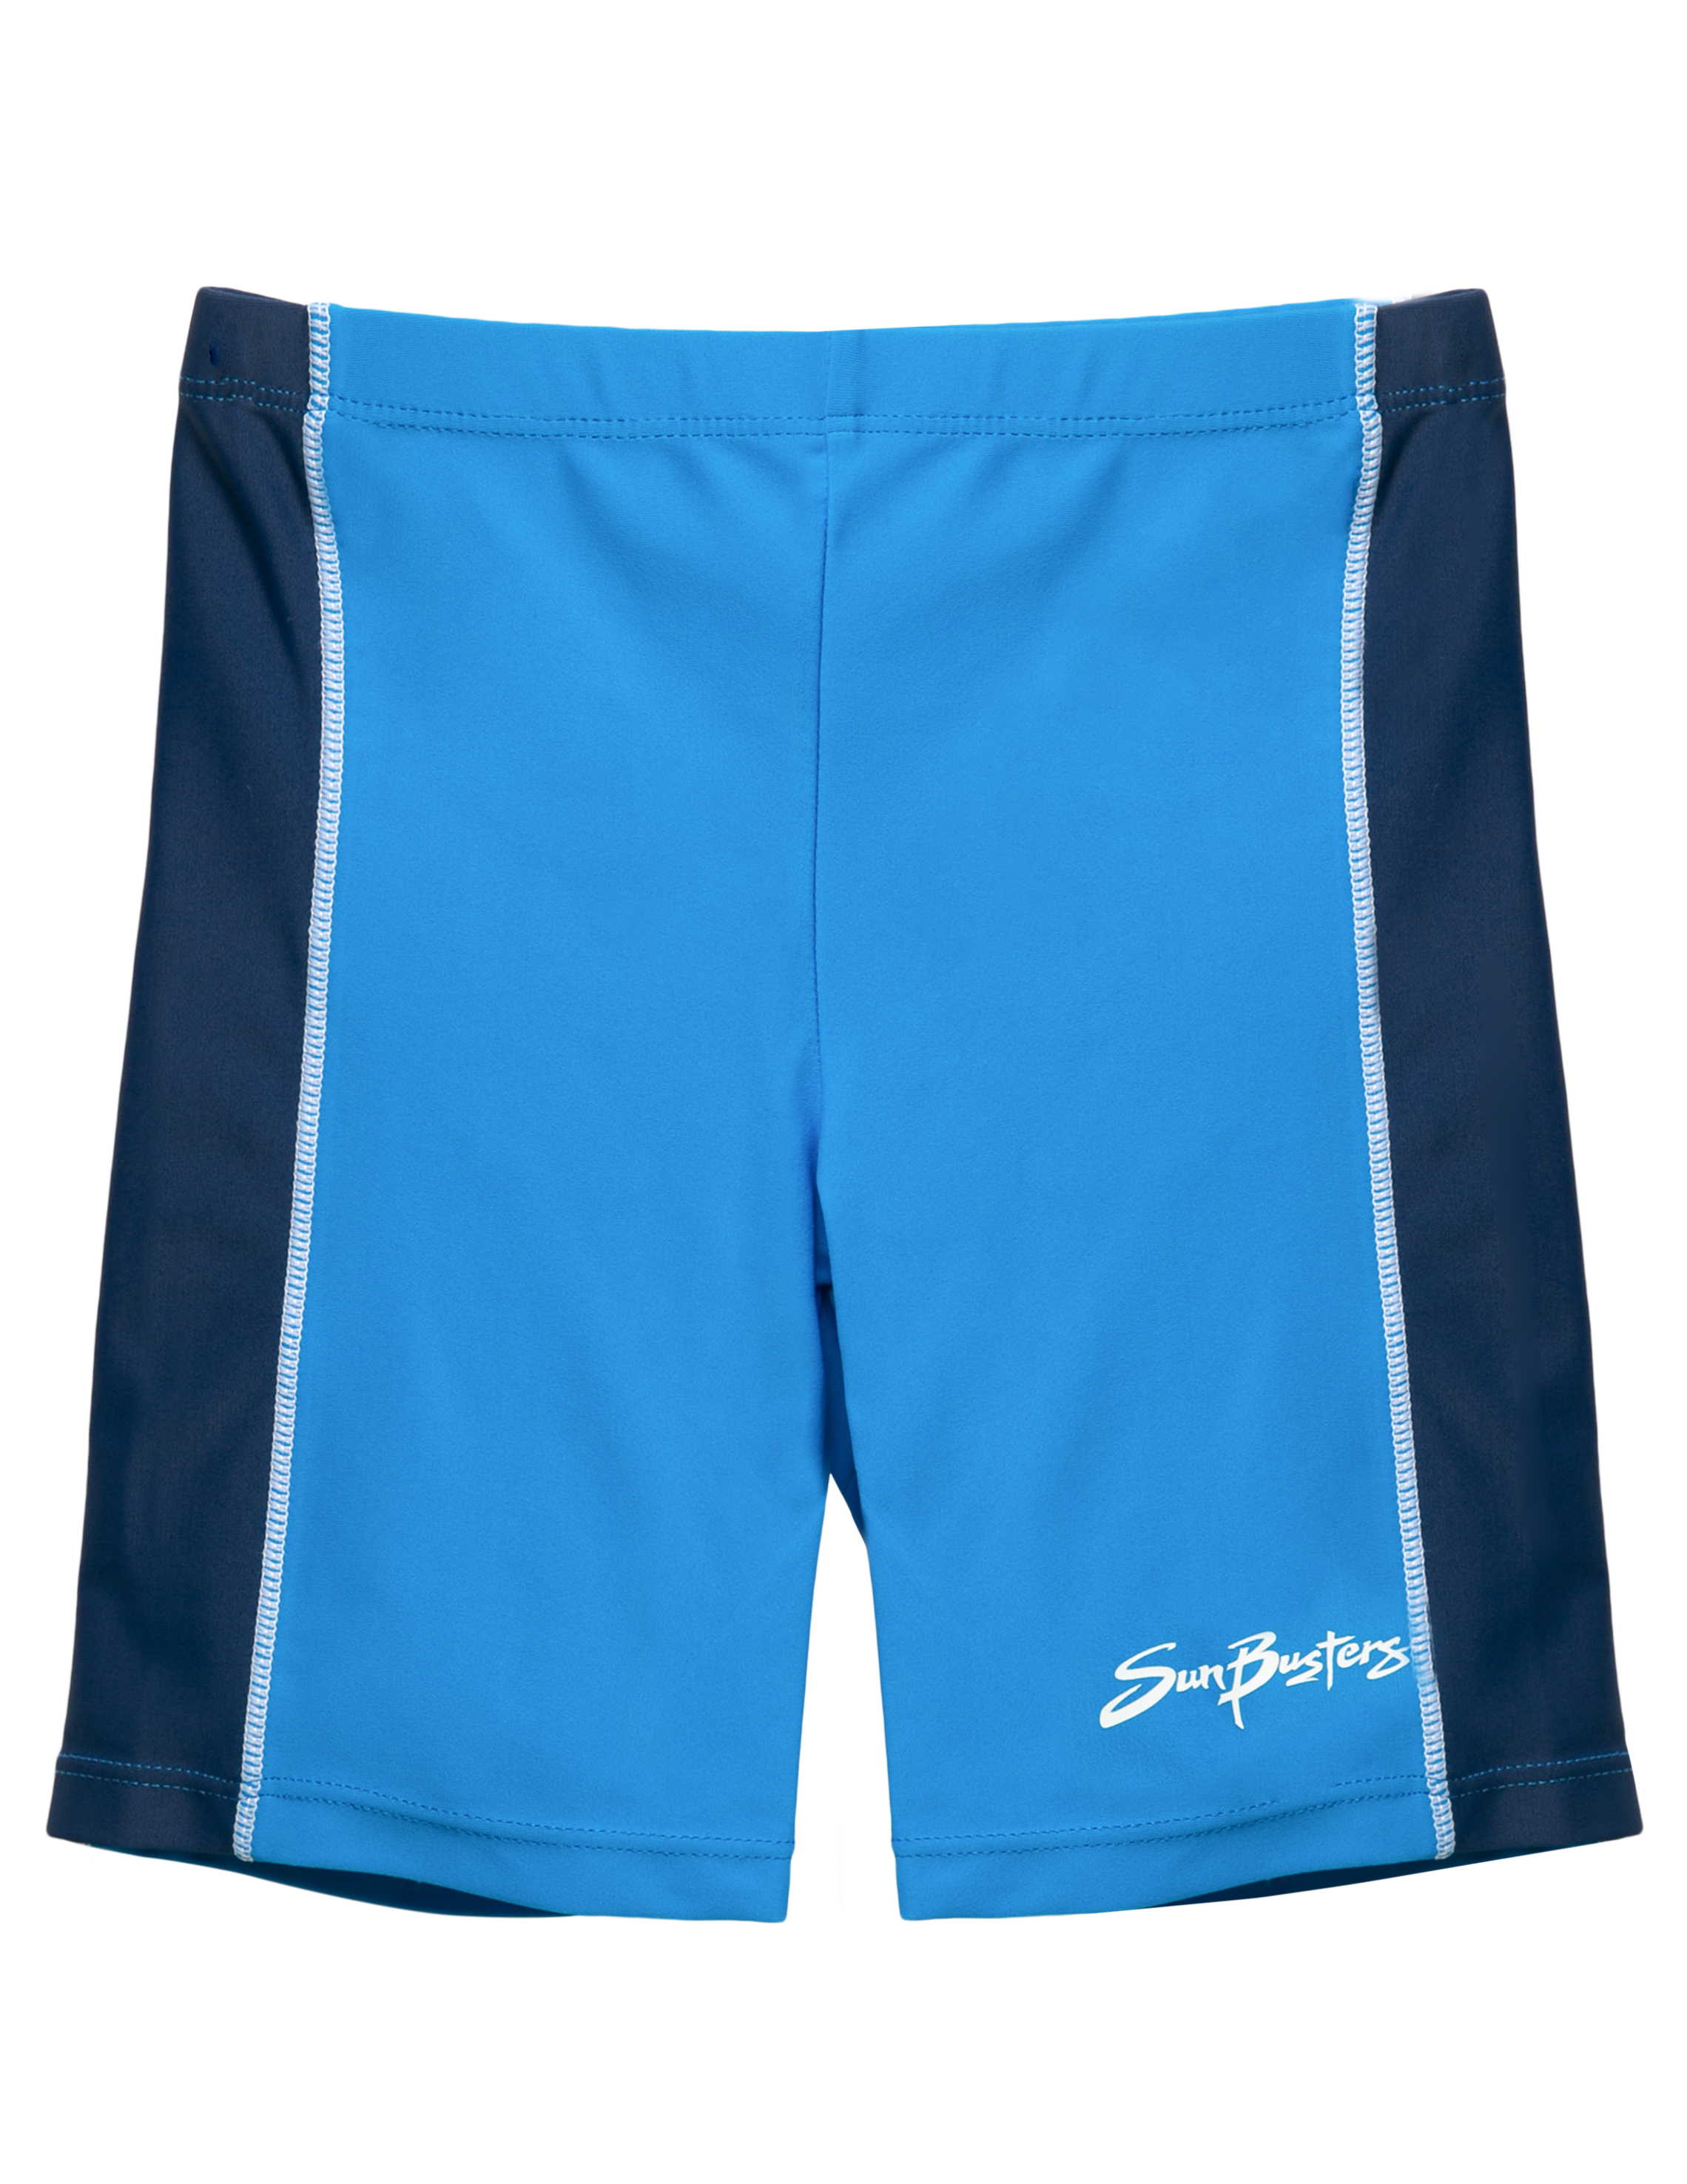 SunBusters Boys Swim Short(UPF 50+), Dusk Blue, 11/12 yrs